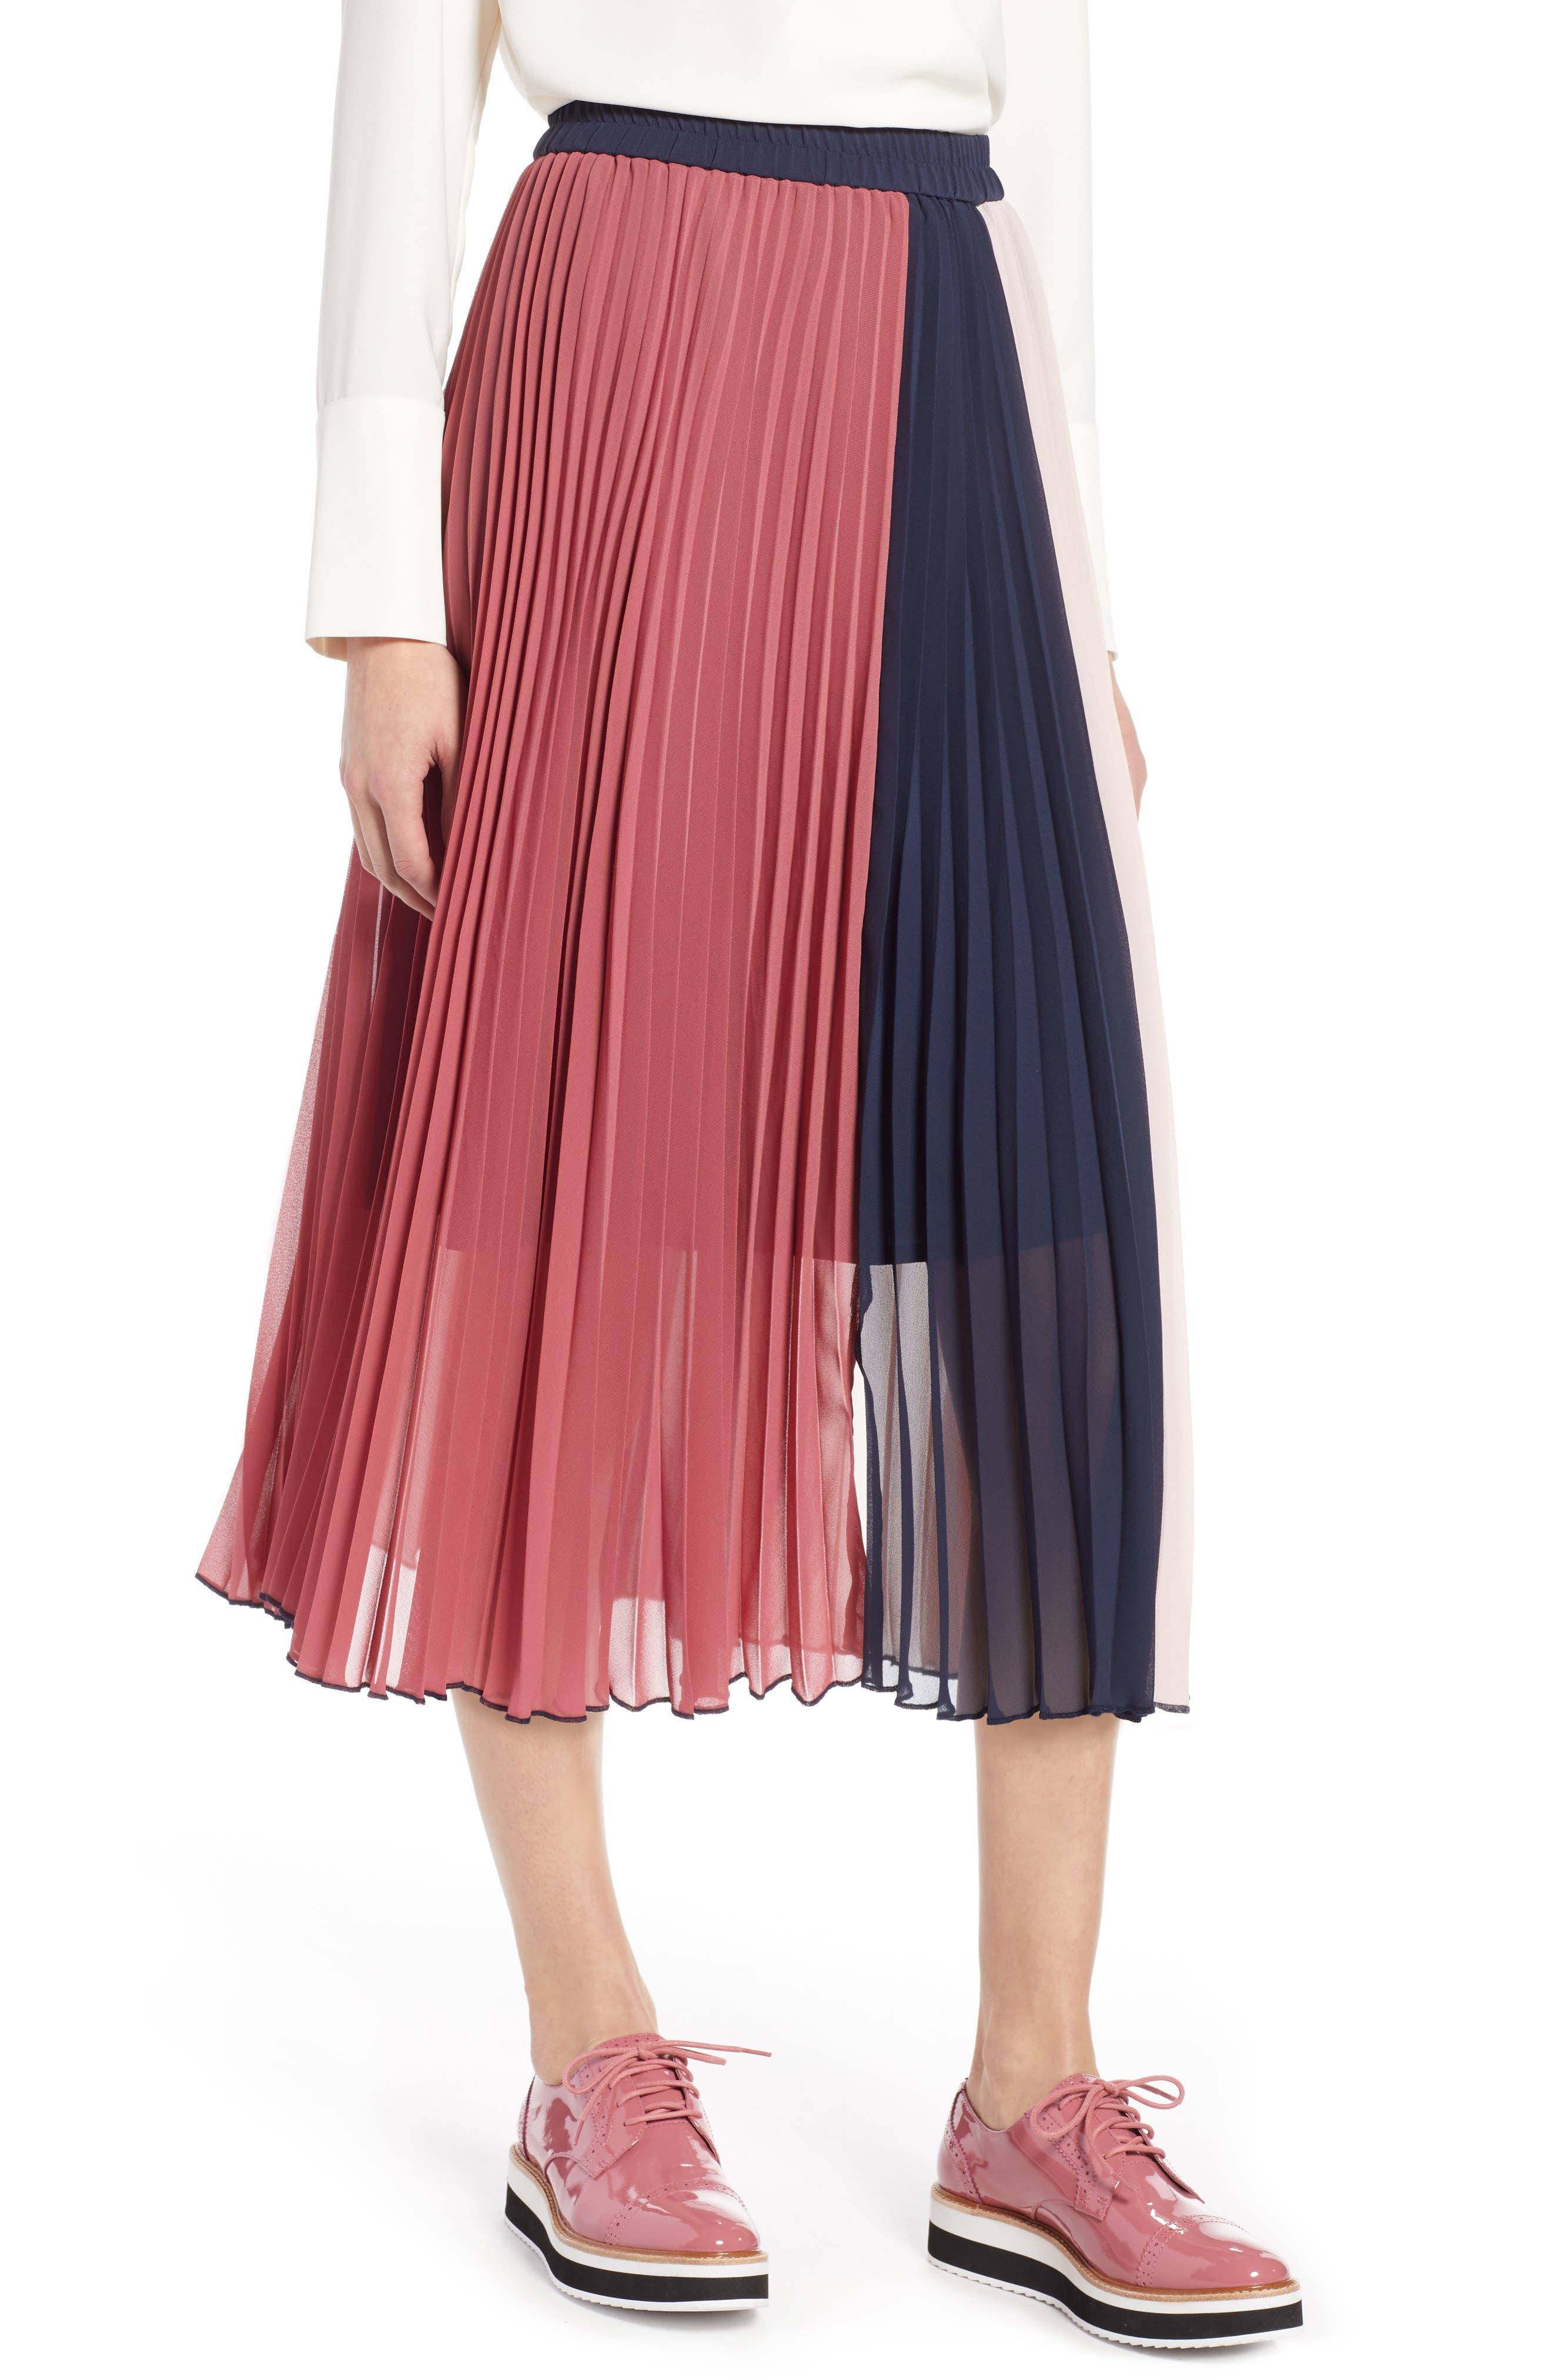 x Atlantic-Pacific Colorblock Pleated Midi Skirt,                         Main,                         color, PINK- NAVY COLORBLOCK